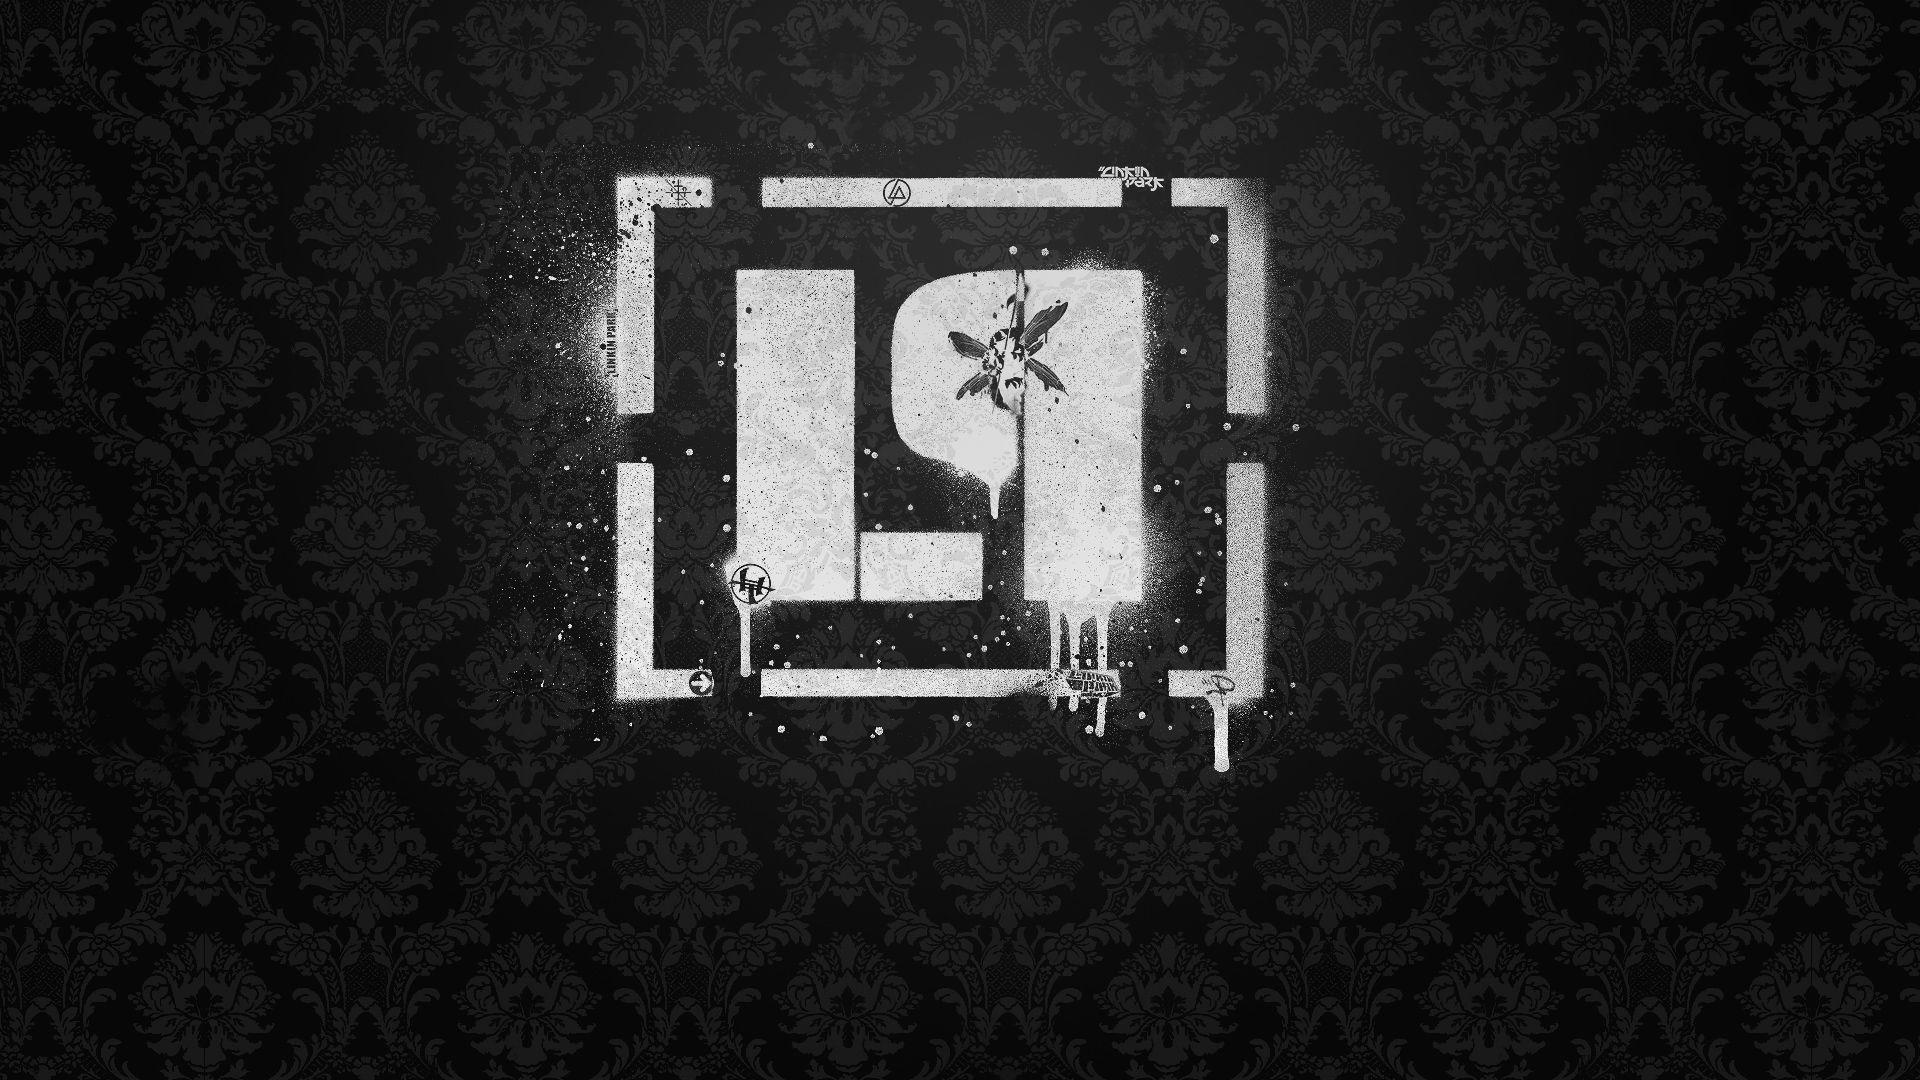 Linkin Park Wallpaper For Pc